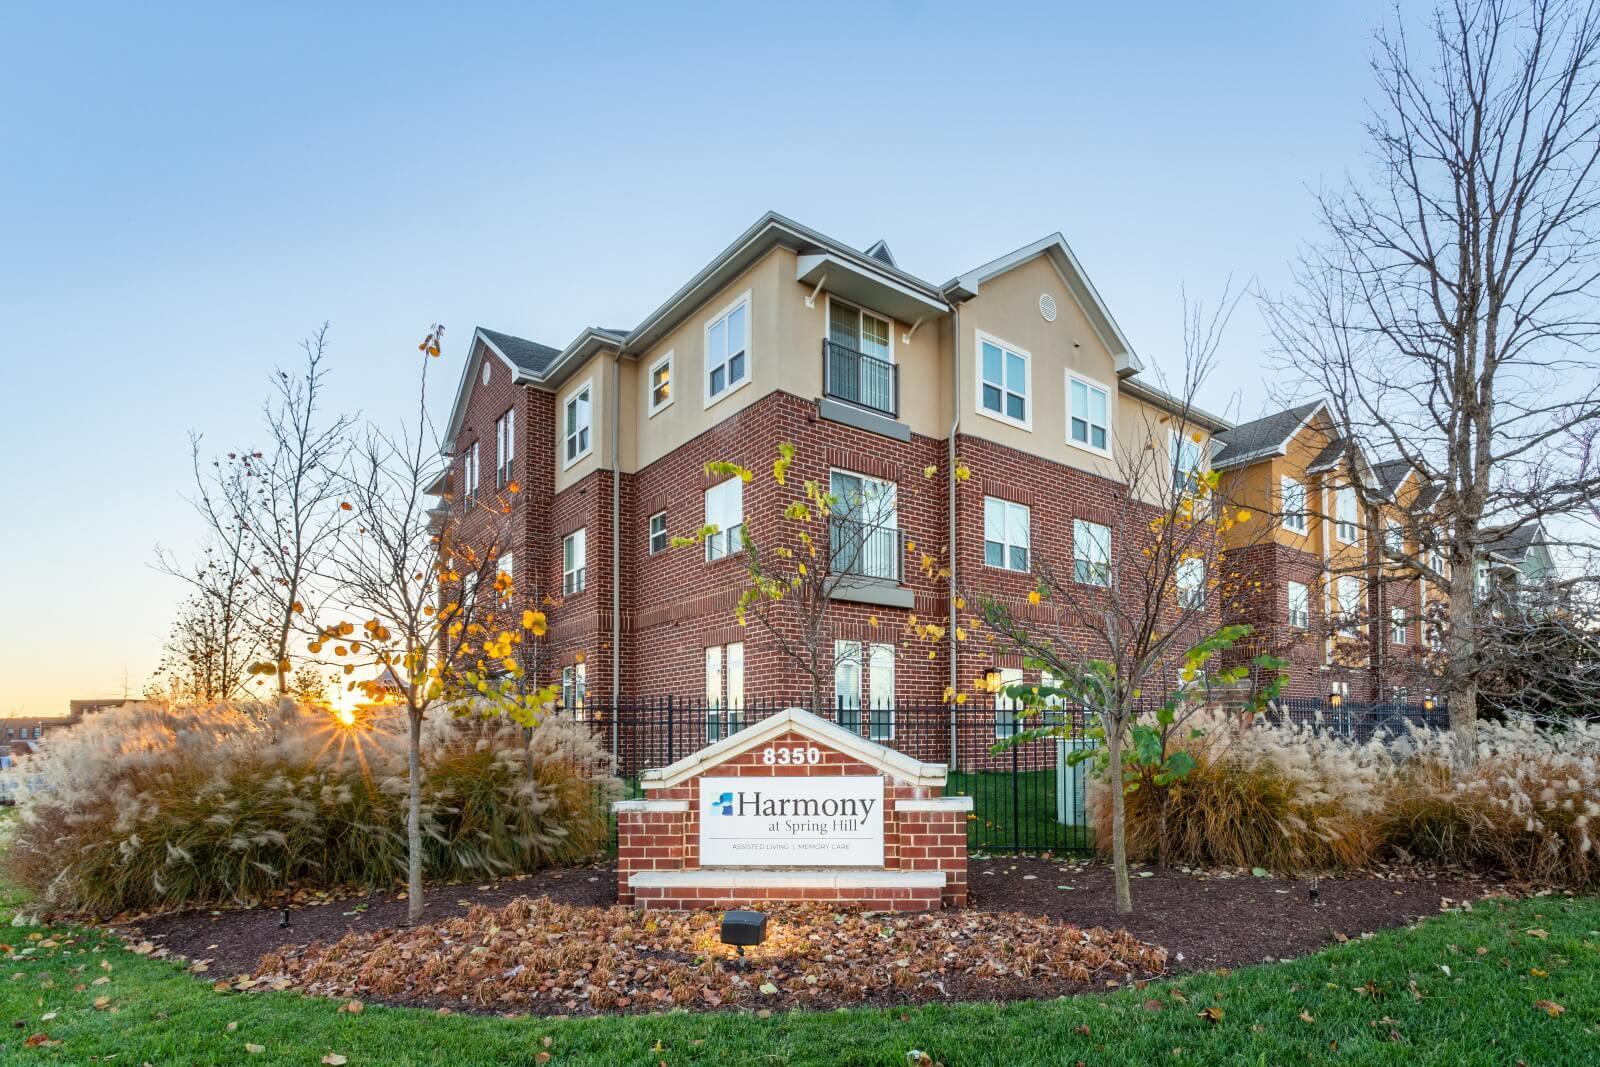 Harmony-at-Spring-Hill-Exterior-2